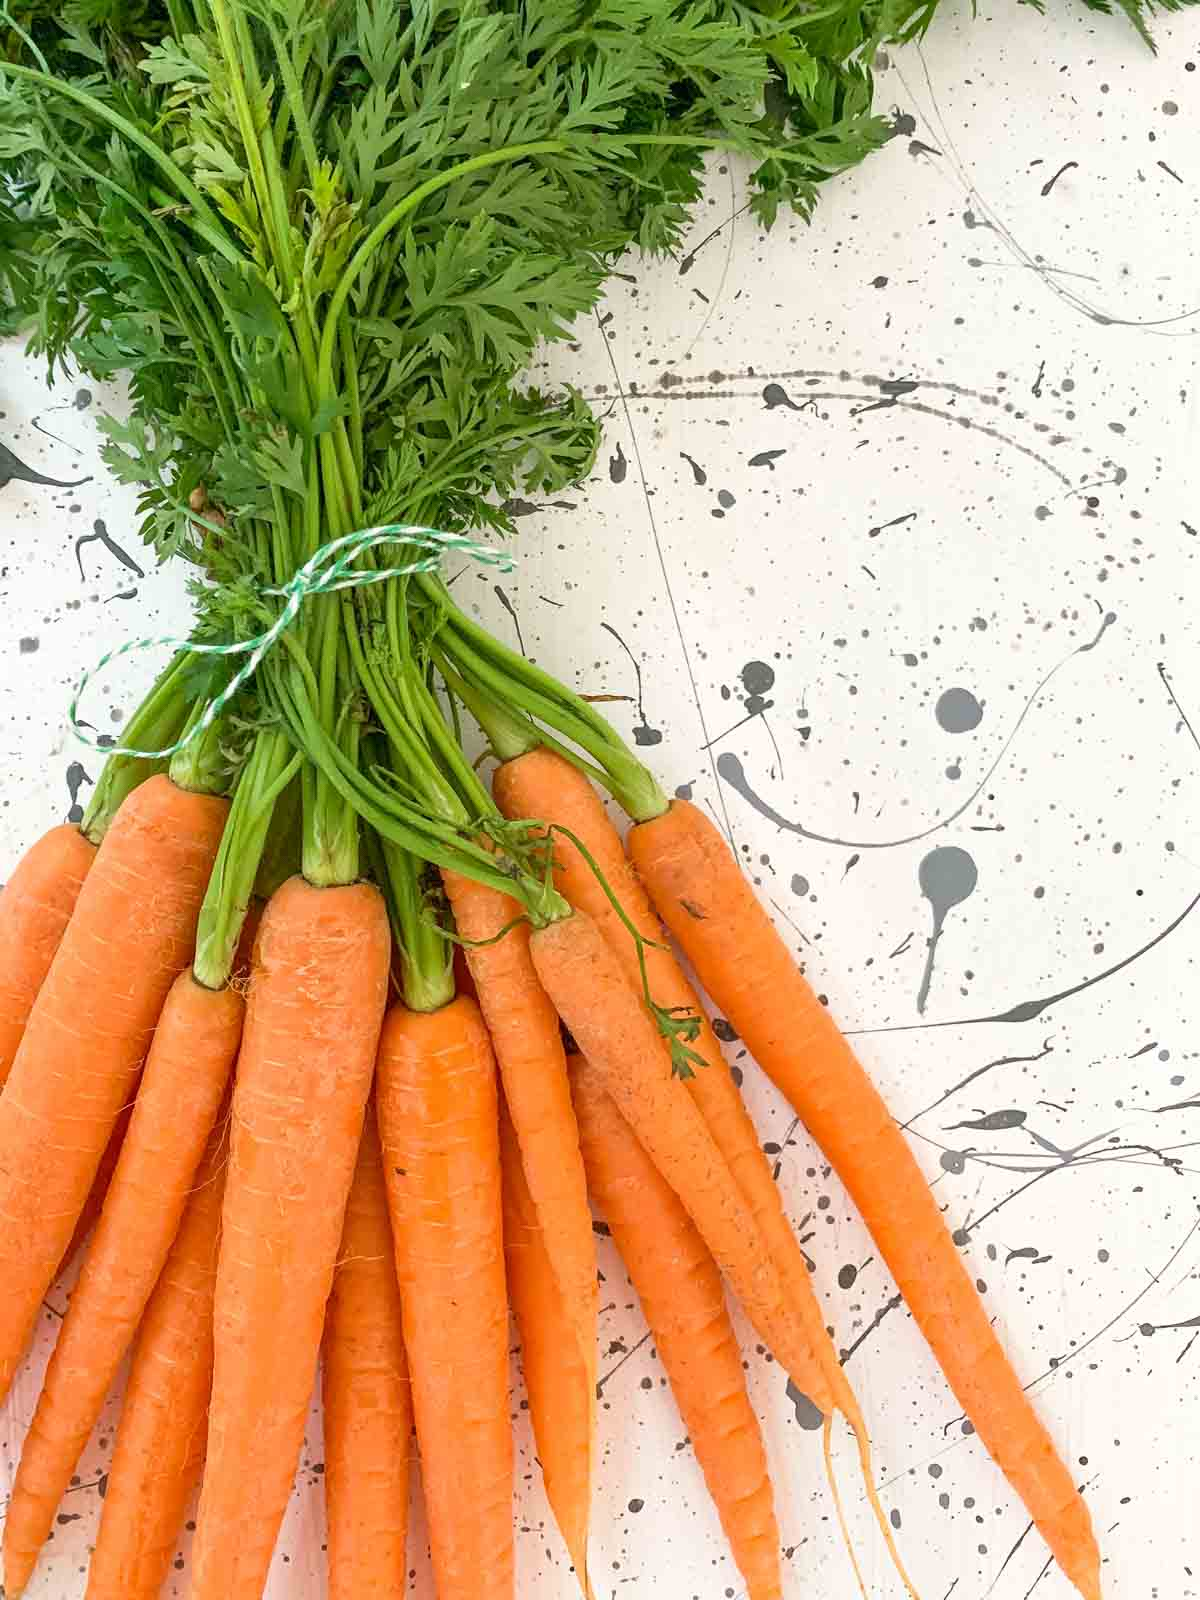 Bunch of Dutch carrots